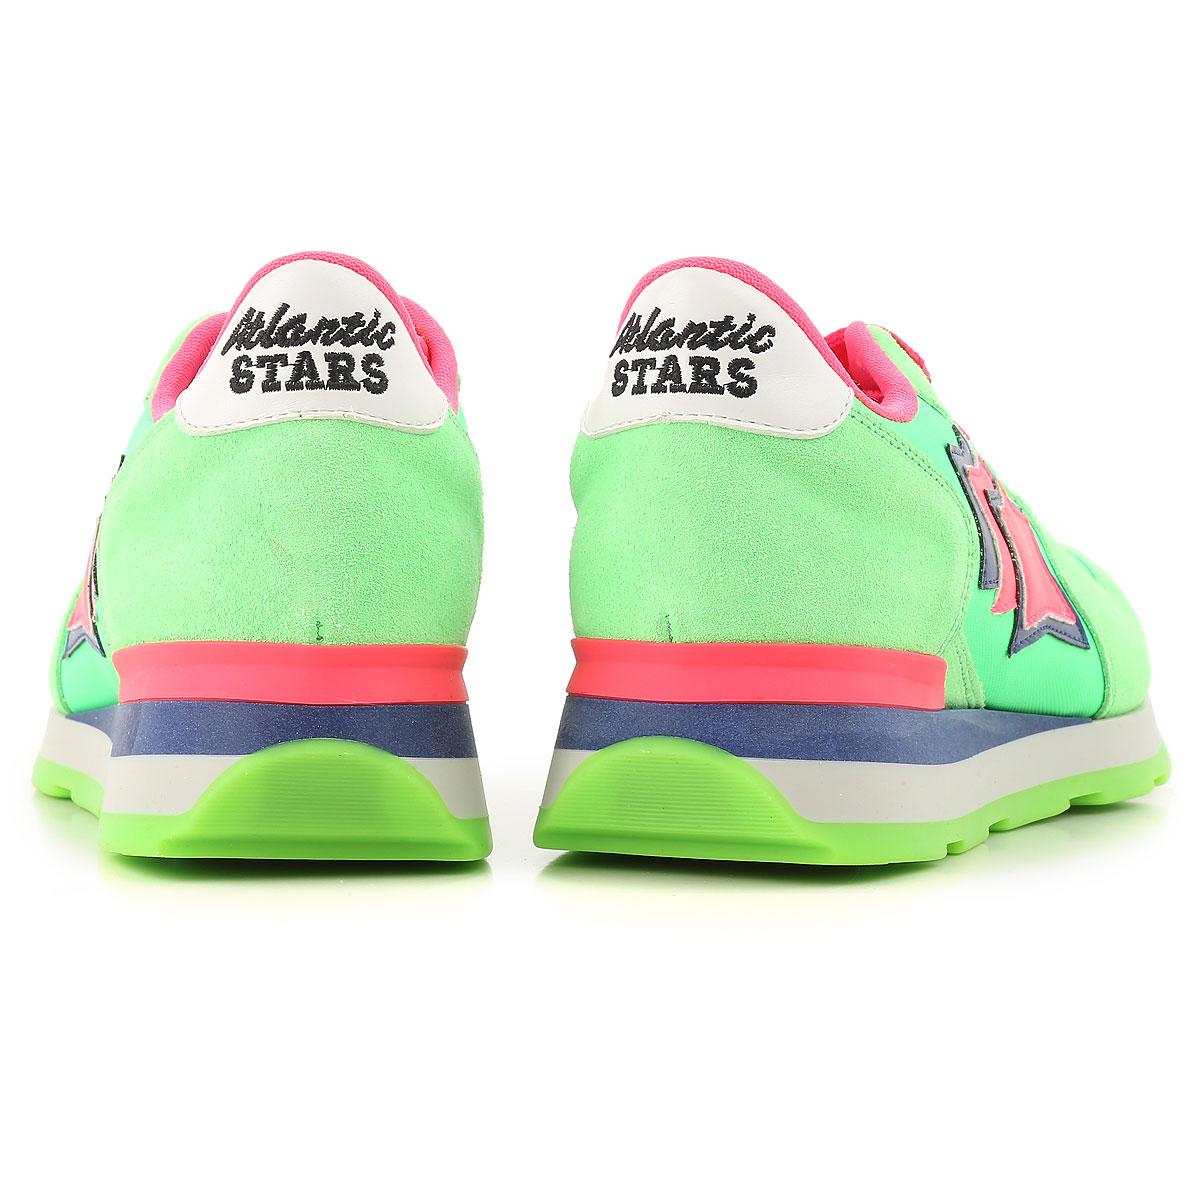 Scarpe Donna Sneakers Atlantic Stars Offerte Limitate